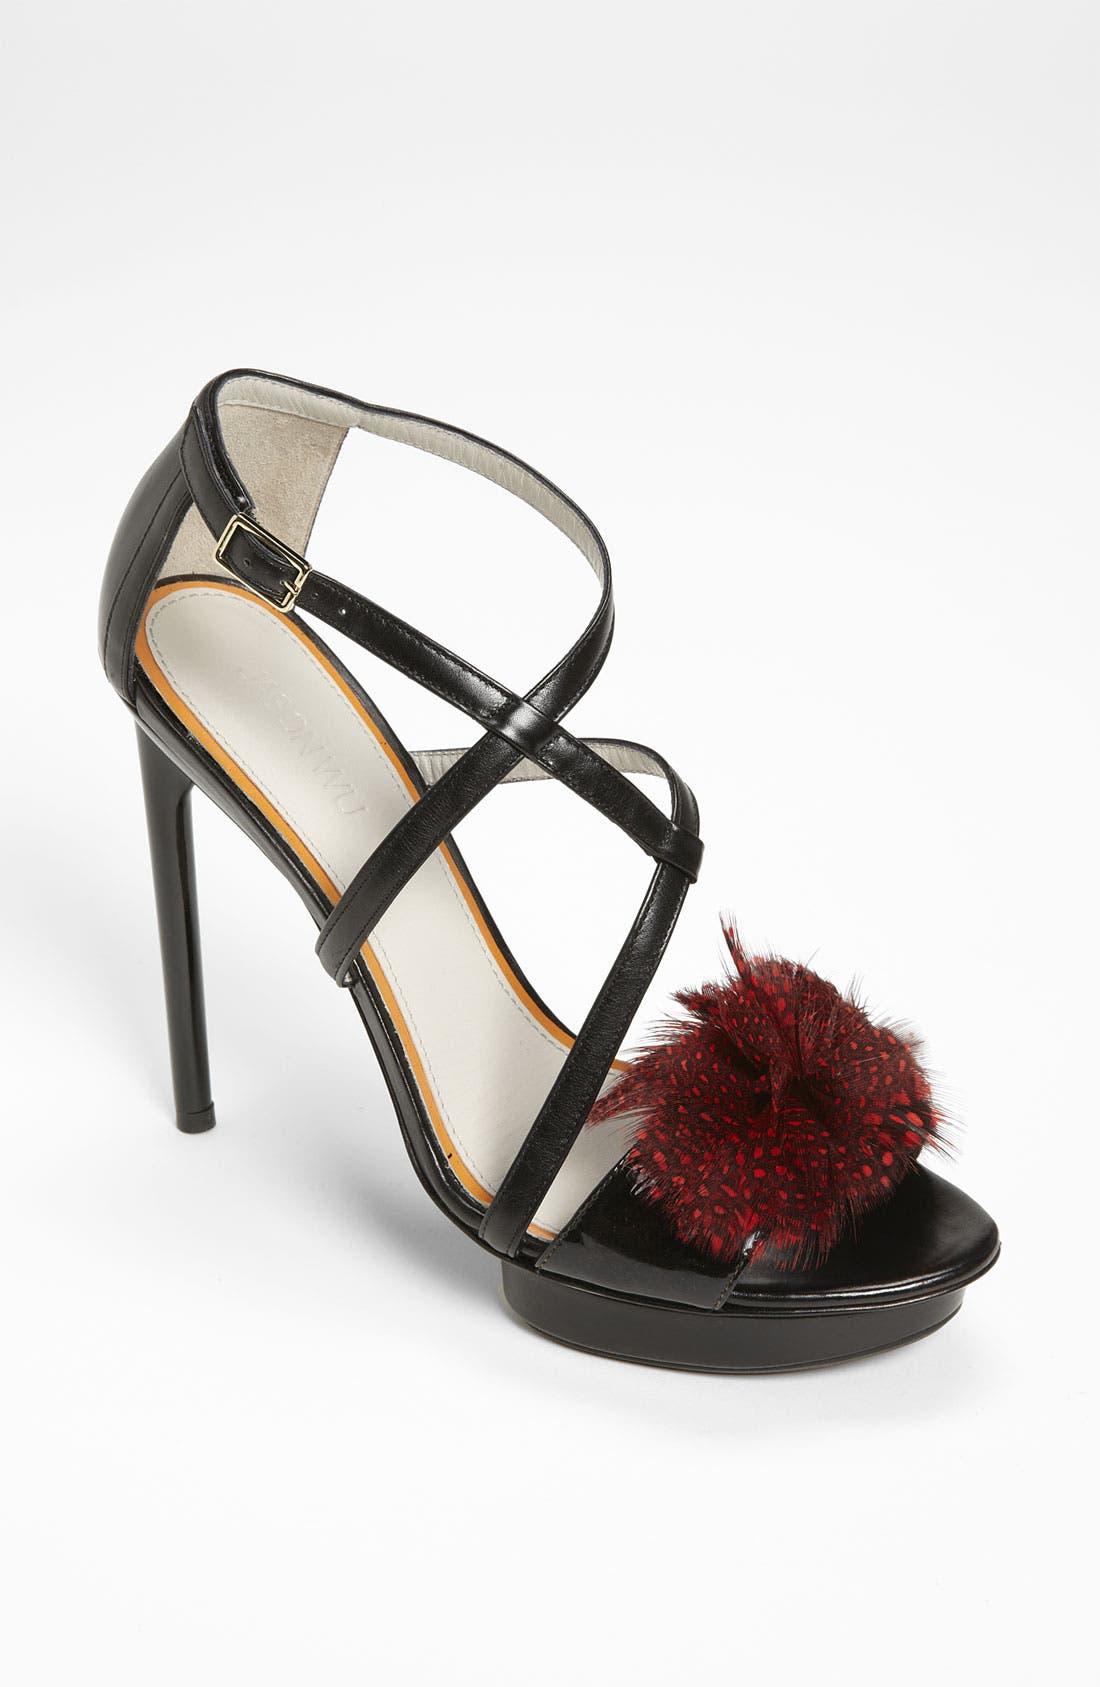 Alternate Image 1 Selected - Jason Wu 'Esme' Sandal